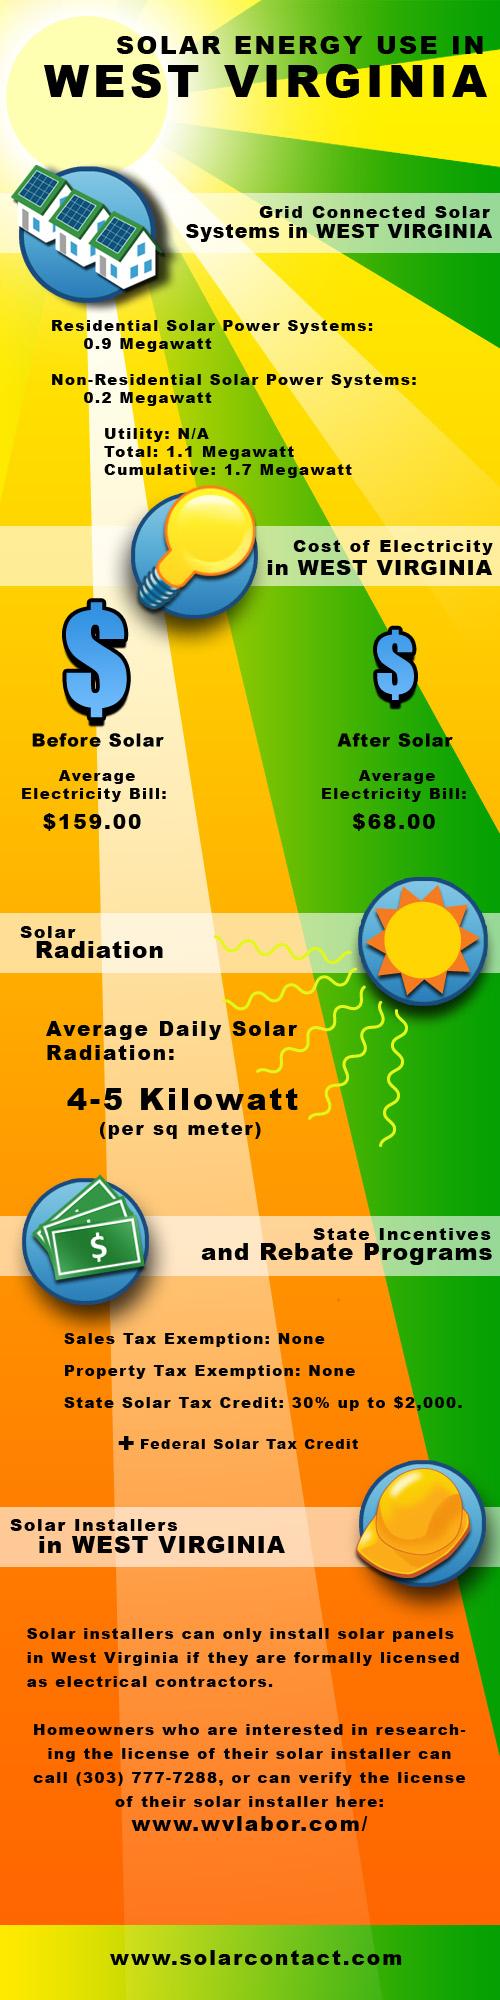 Fact Sheet Solar Energy Use in West Virginia